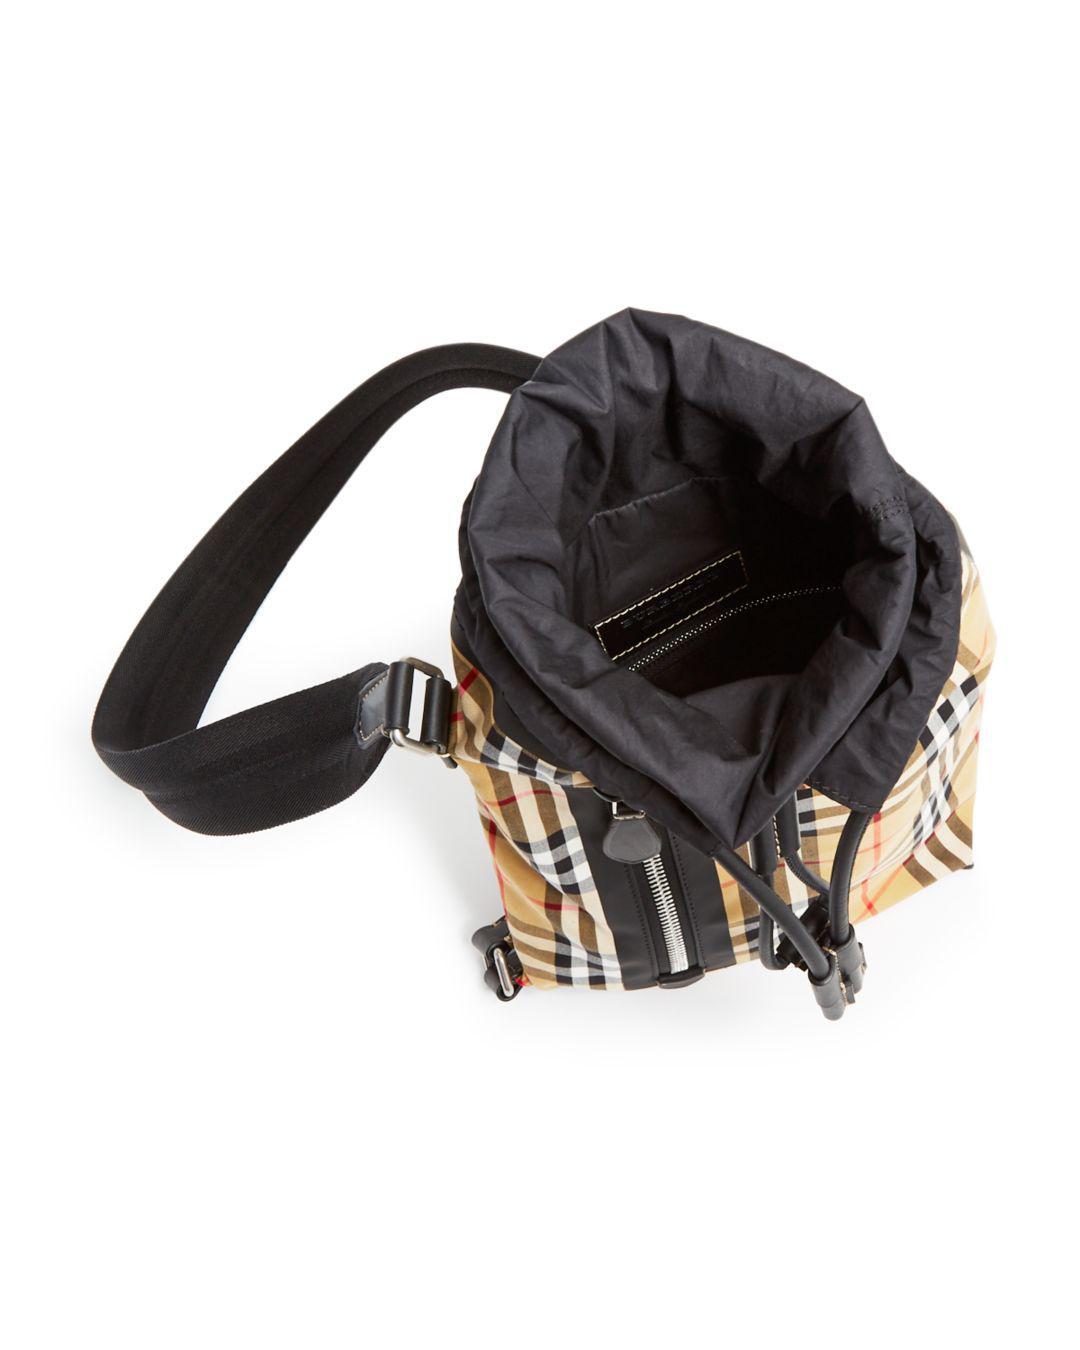 3ca6b9259da2 Burberry - Black Small Vintage Check Duffel Bag - Lyst. View fullscreen